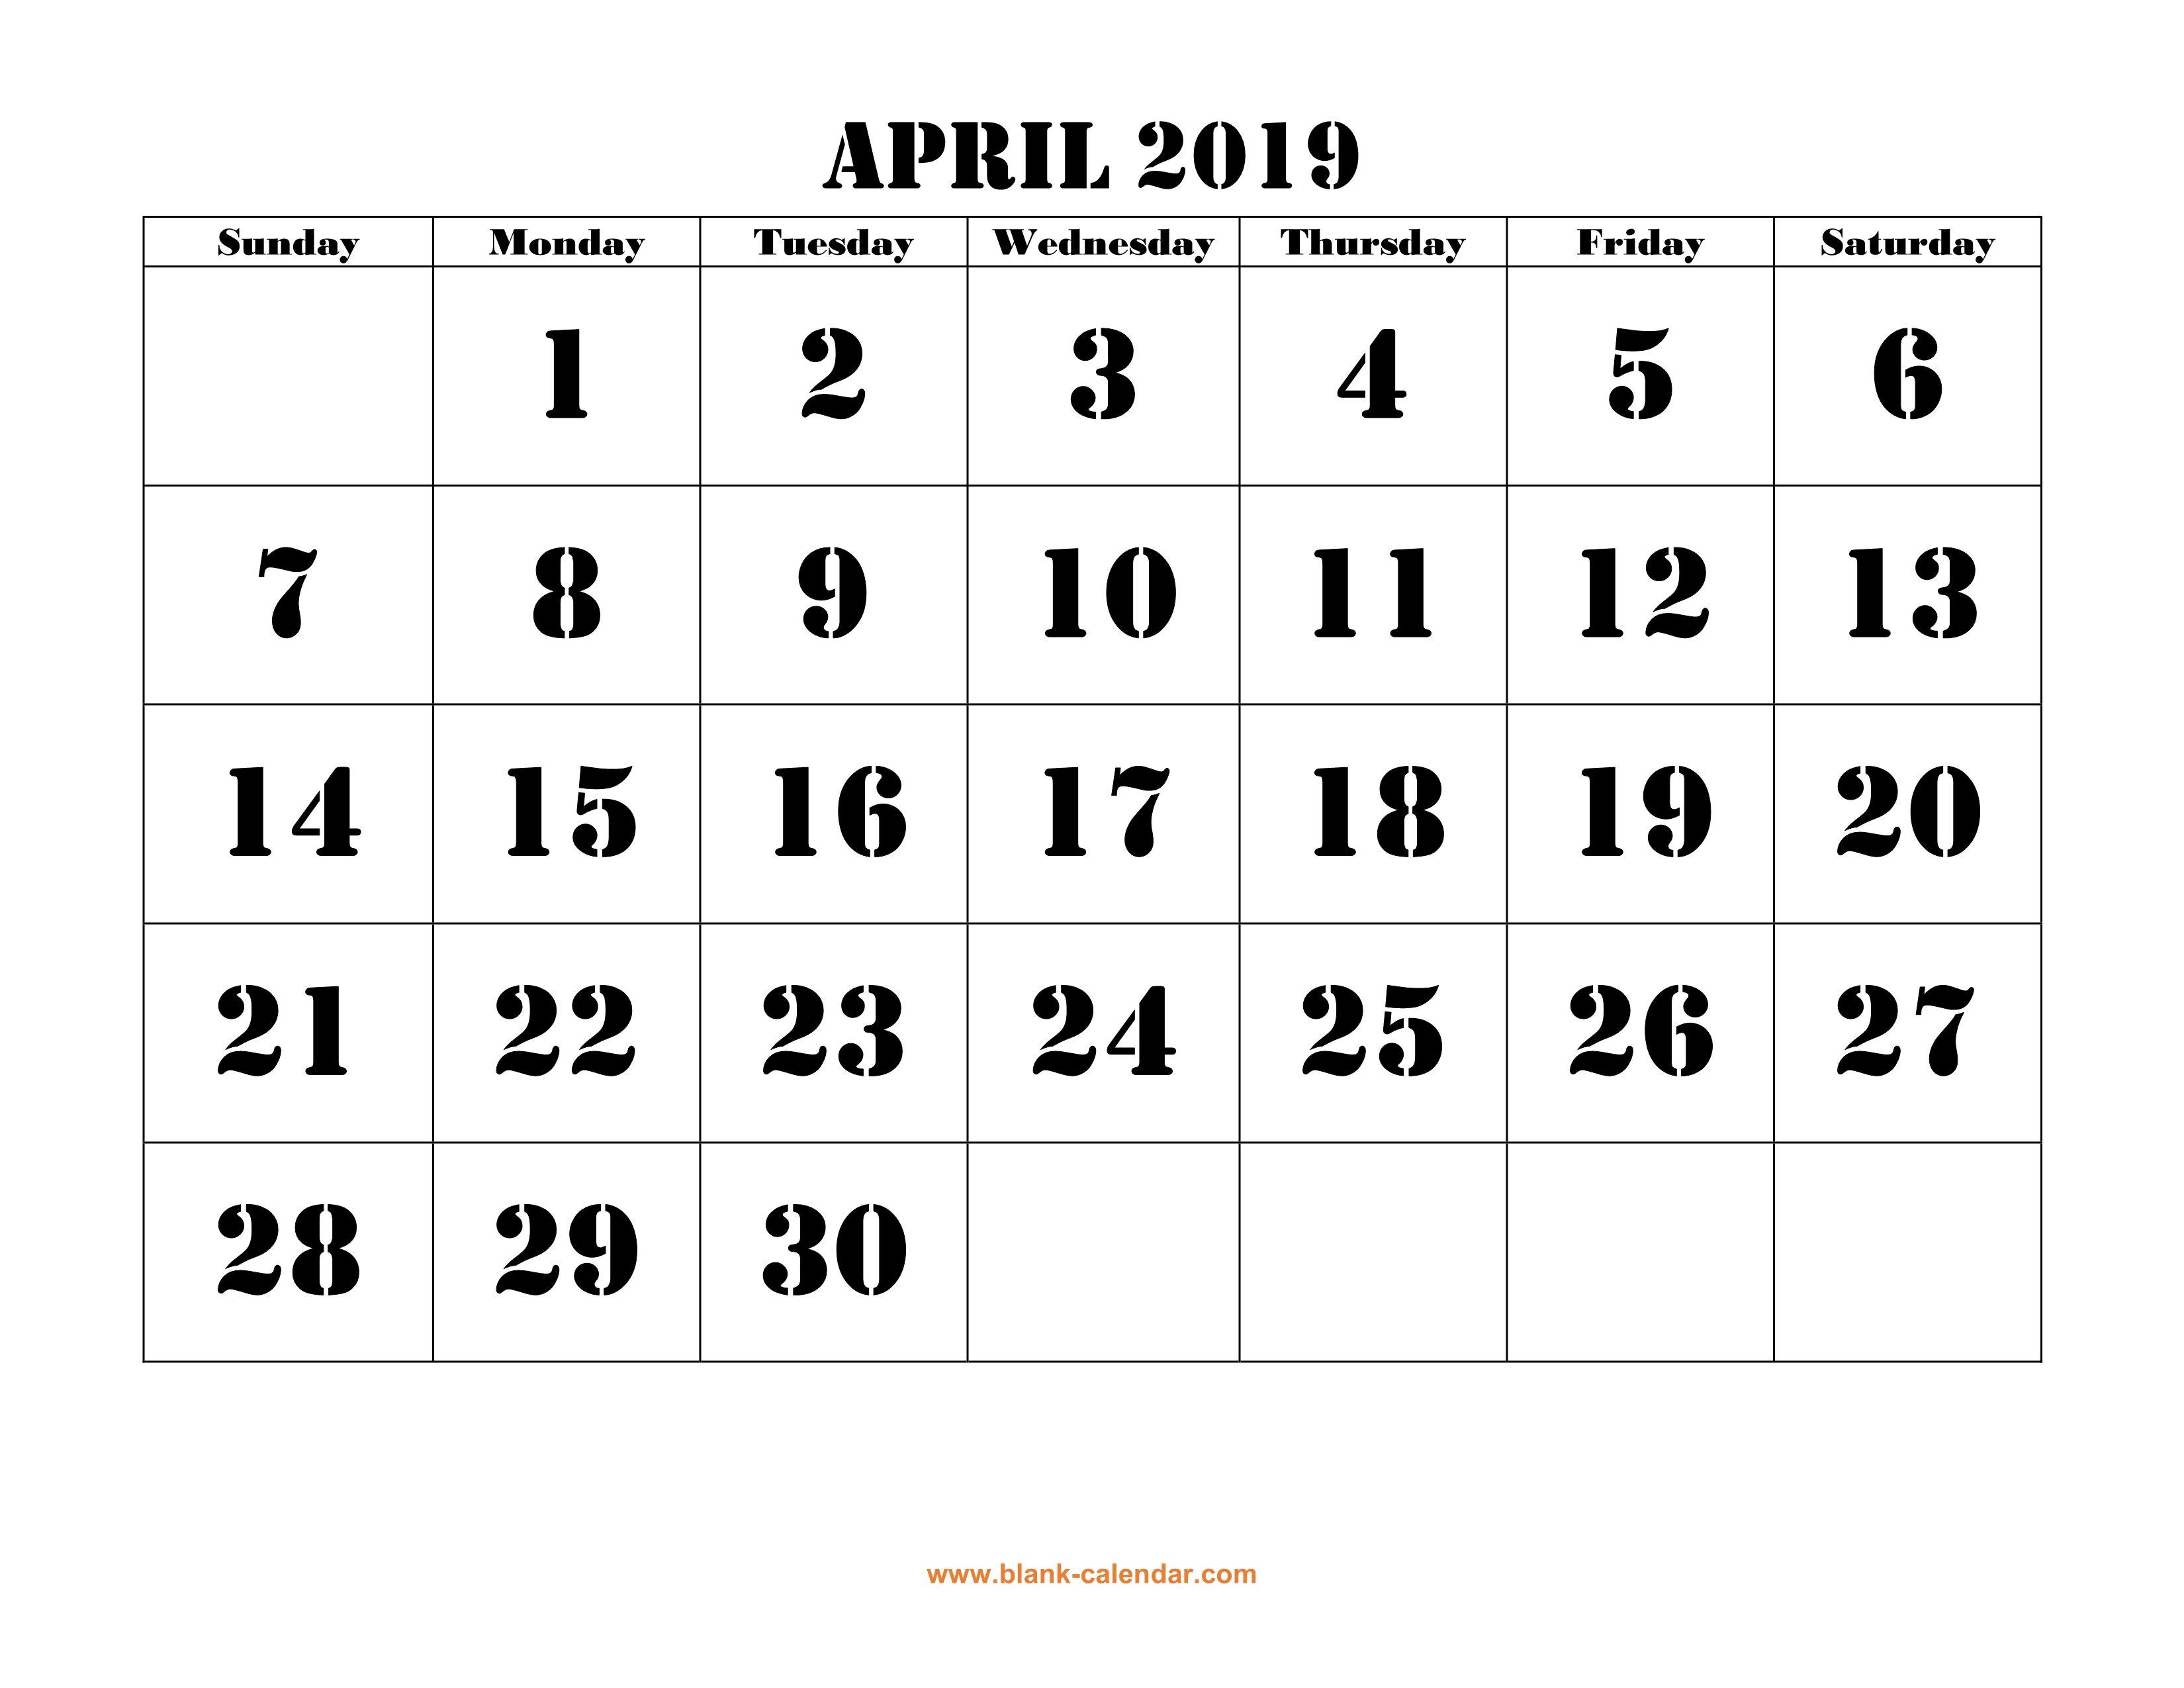 Free Download Printable April 2019 Calendar, Large Font Design April 7 2019 Calendar